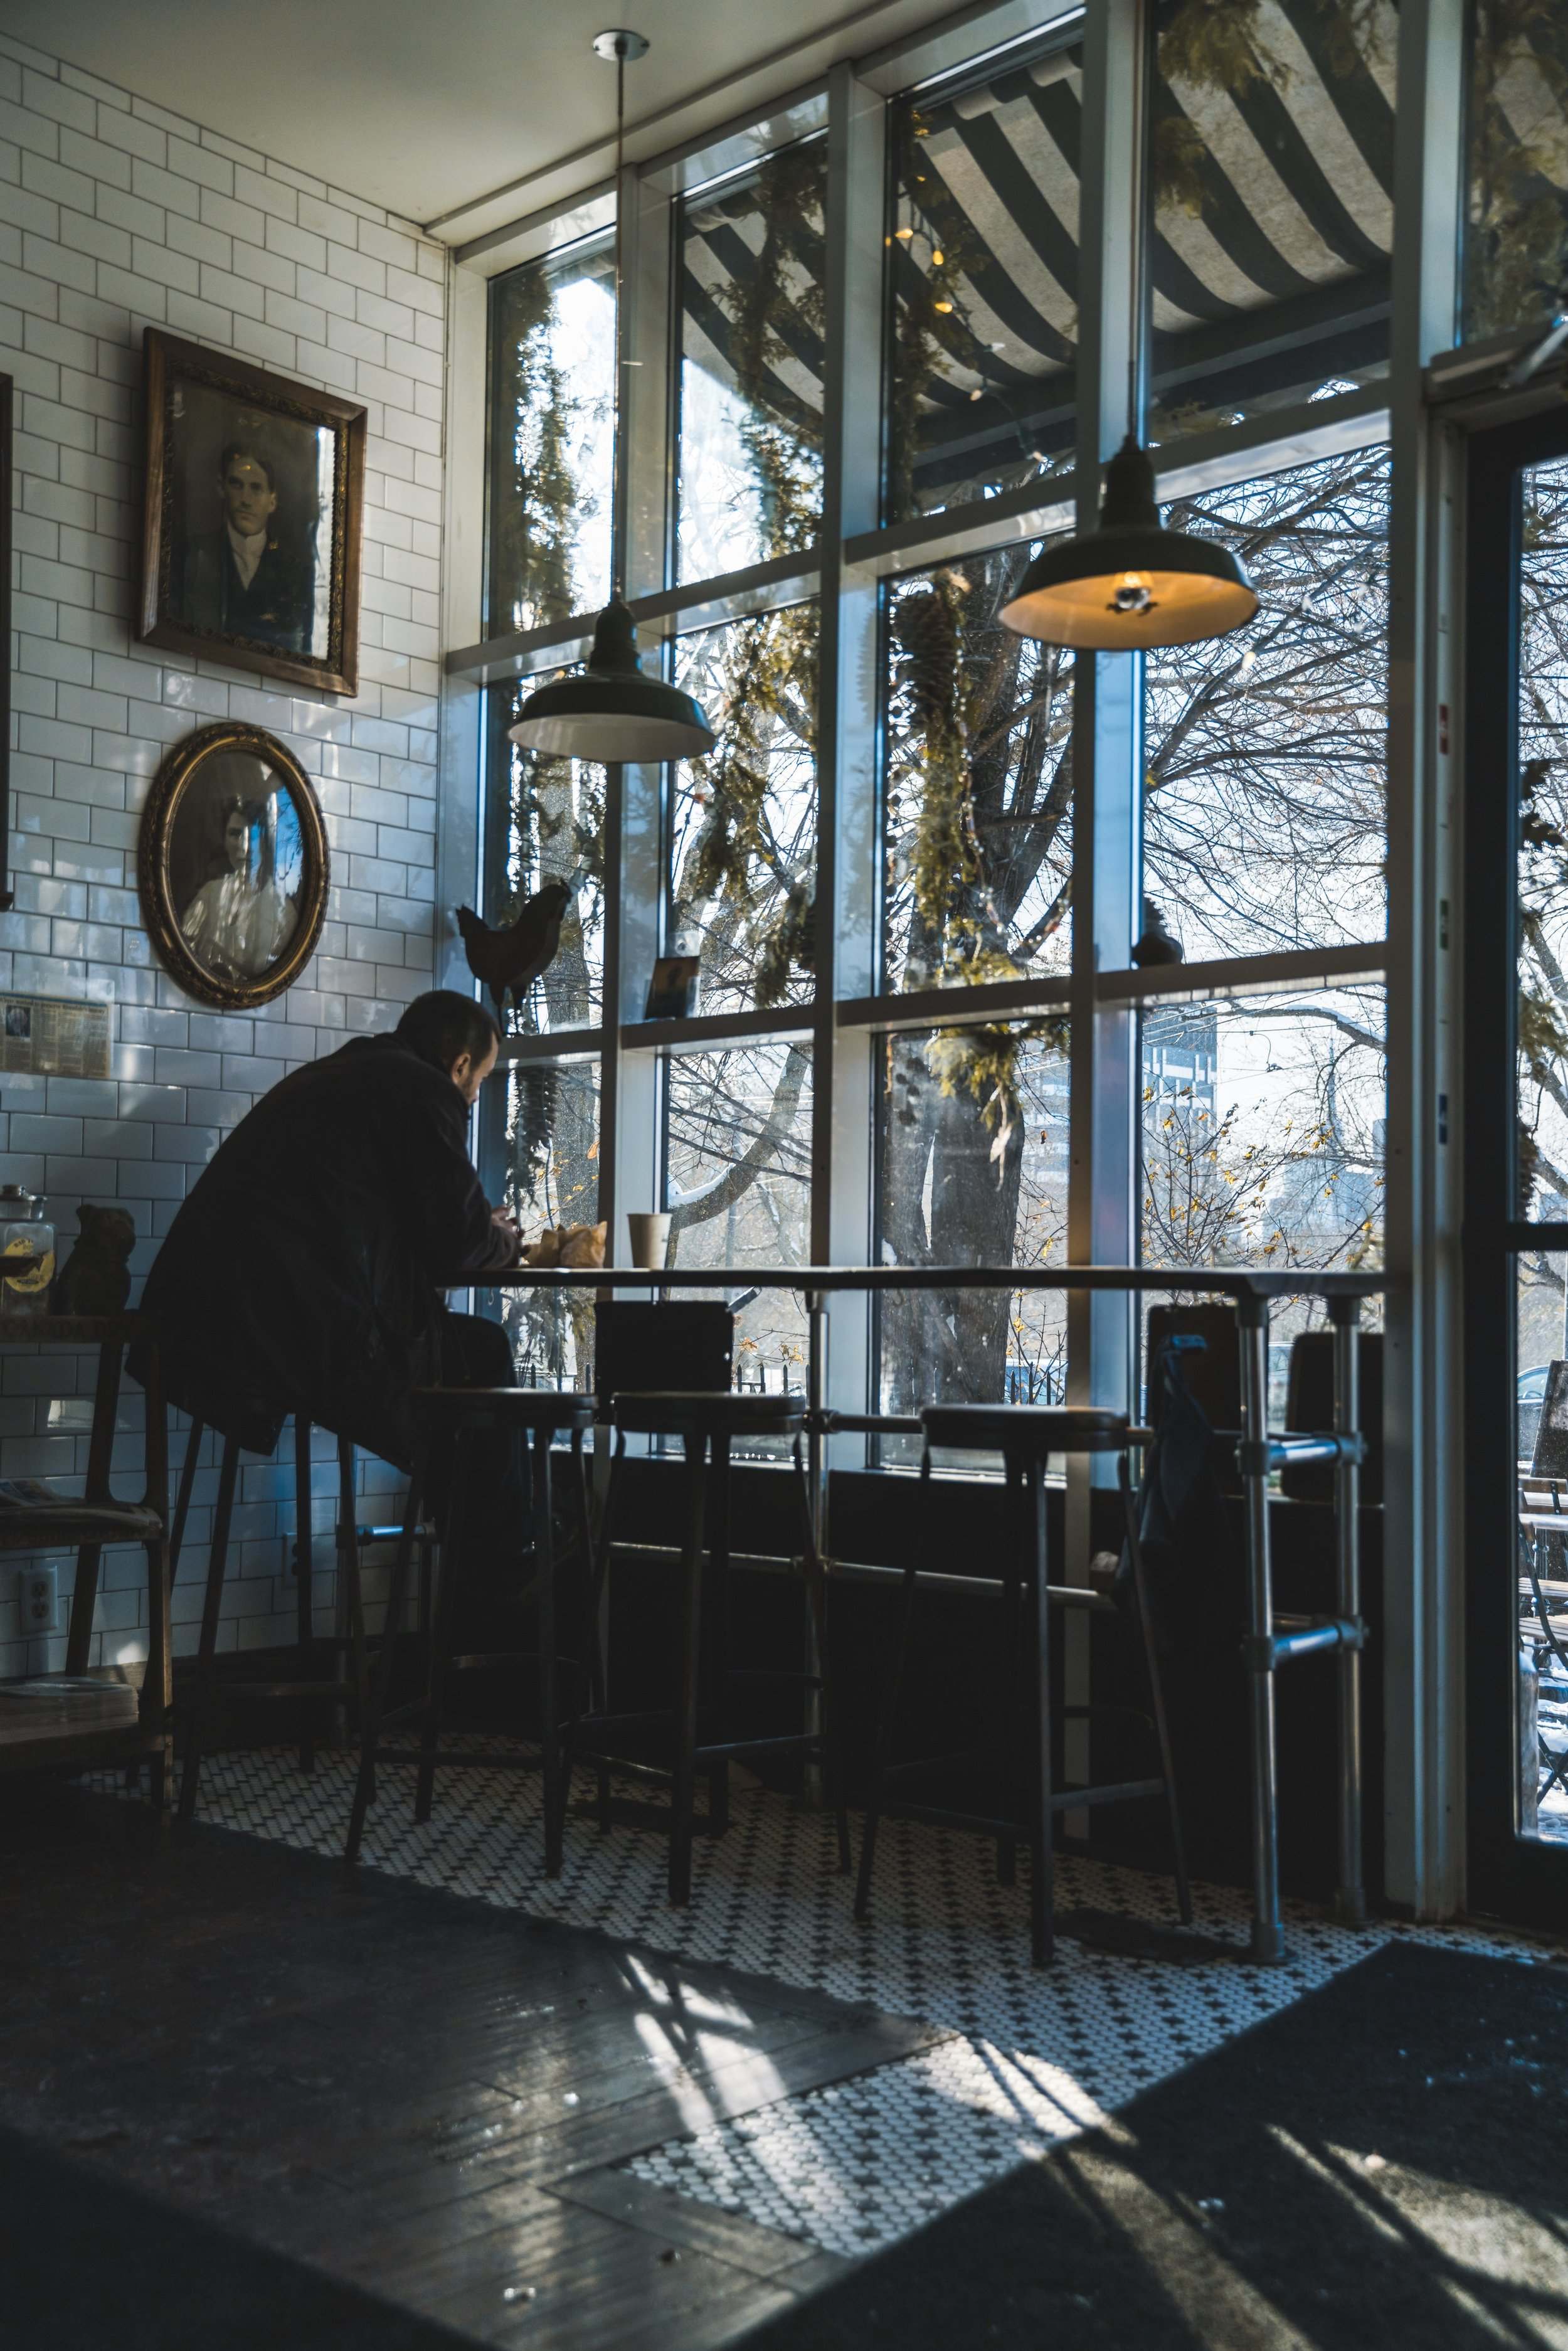 bright-winter-through-cafe-window_4460x4460.jpg